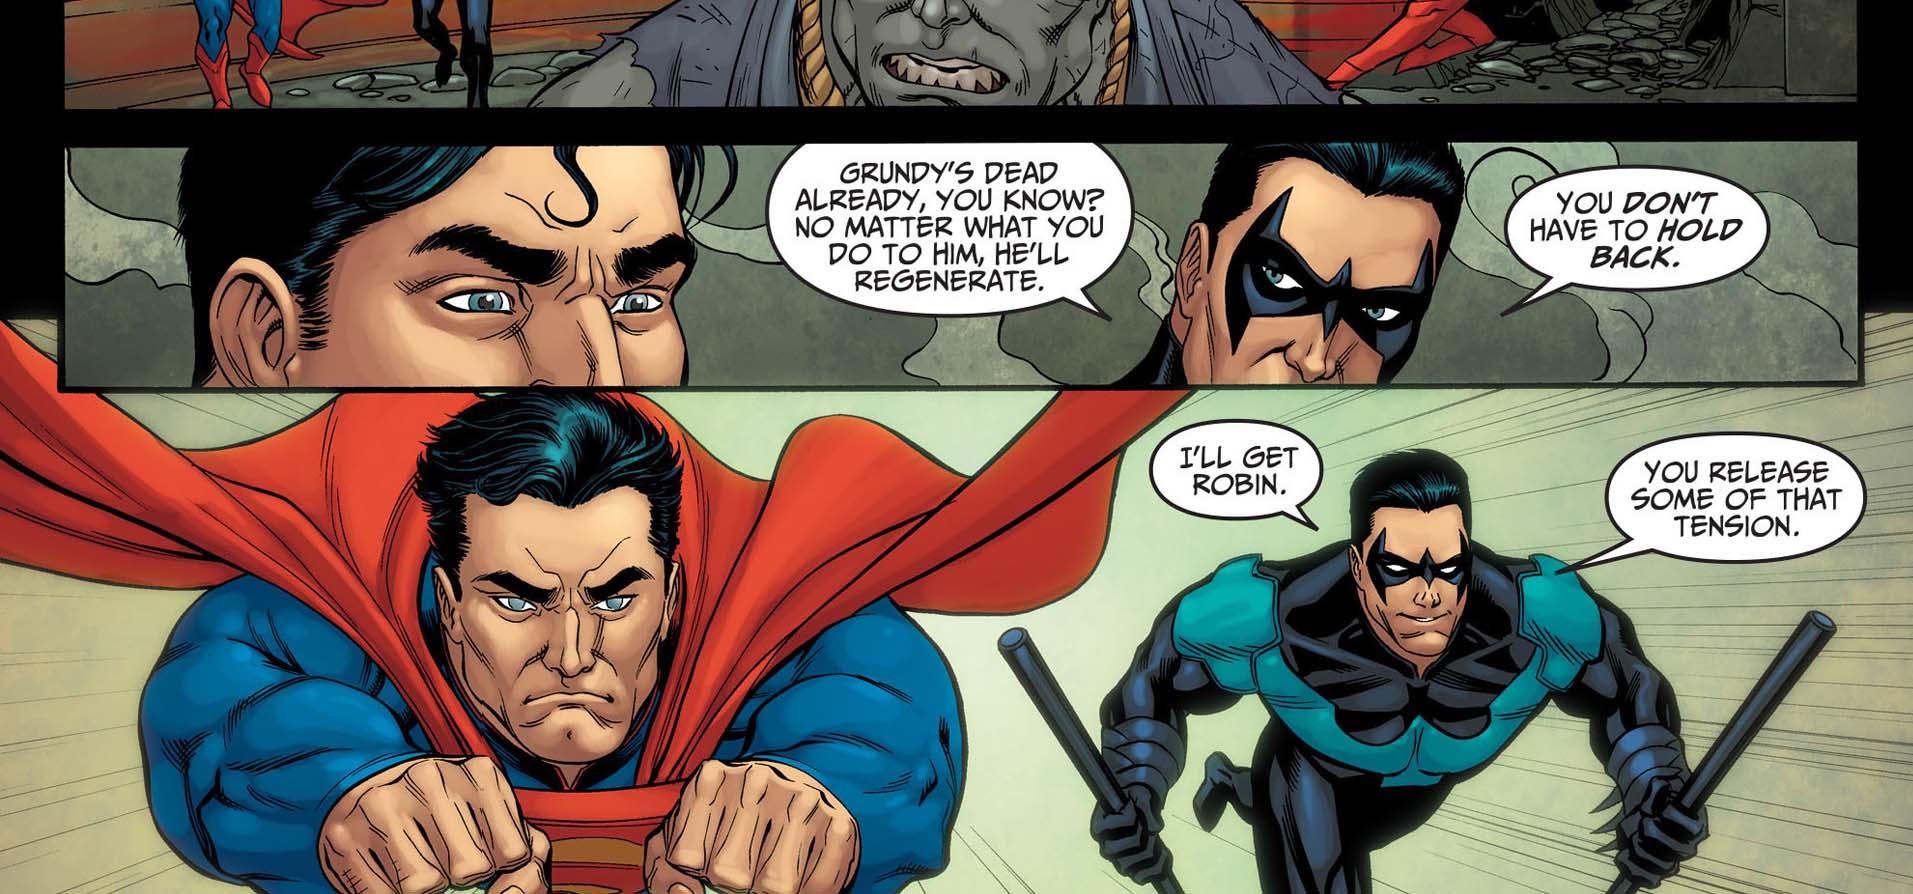 superman against undead